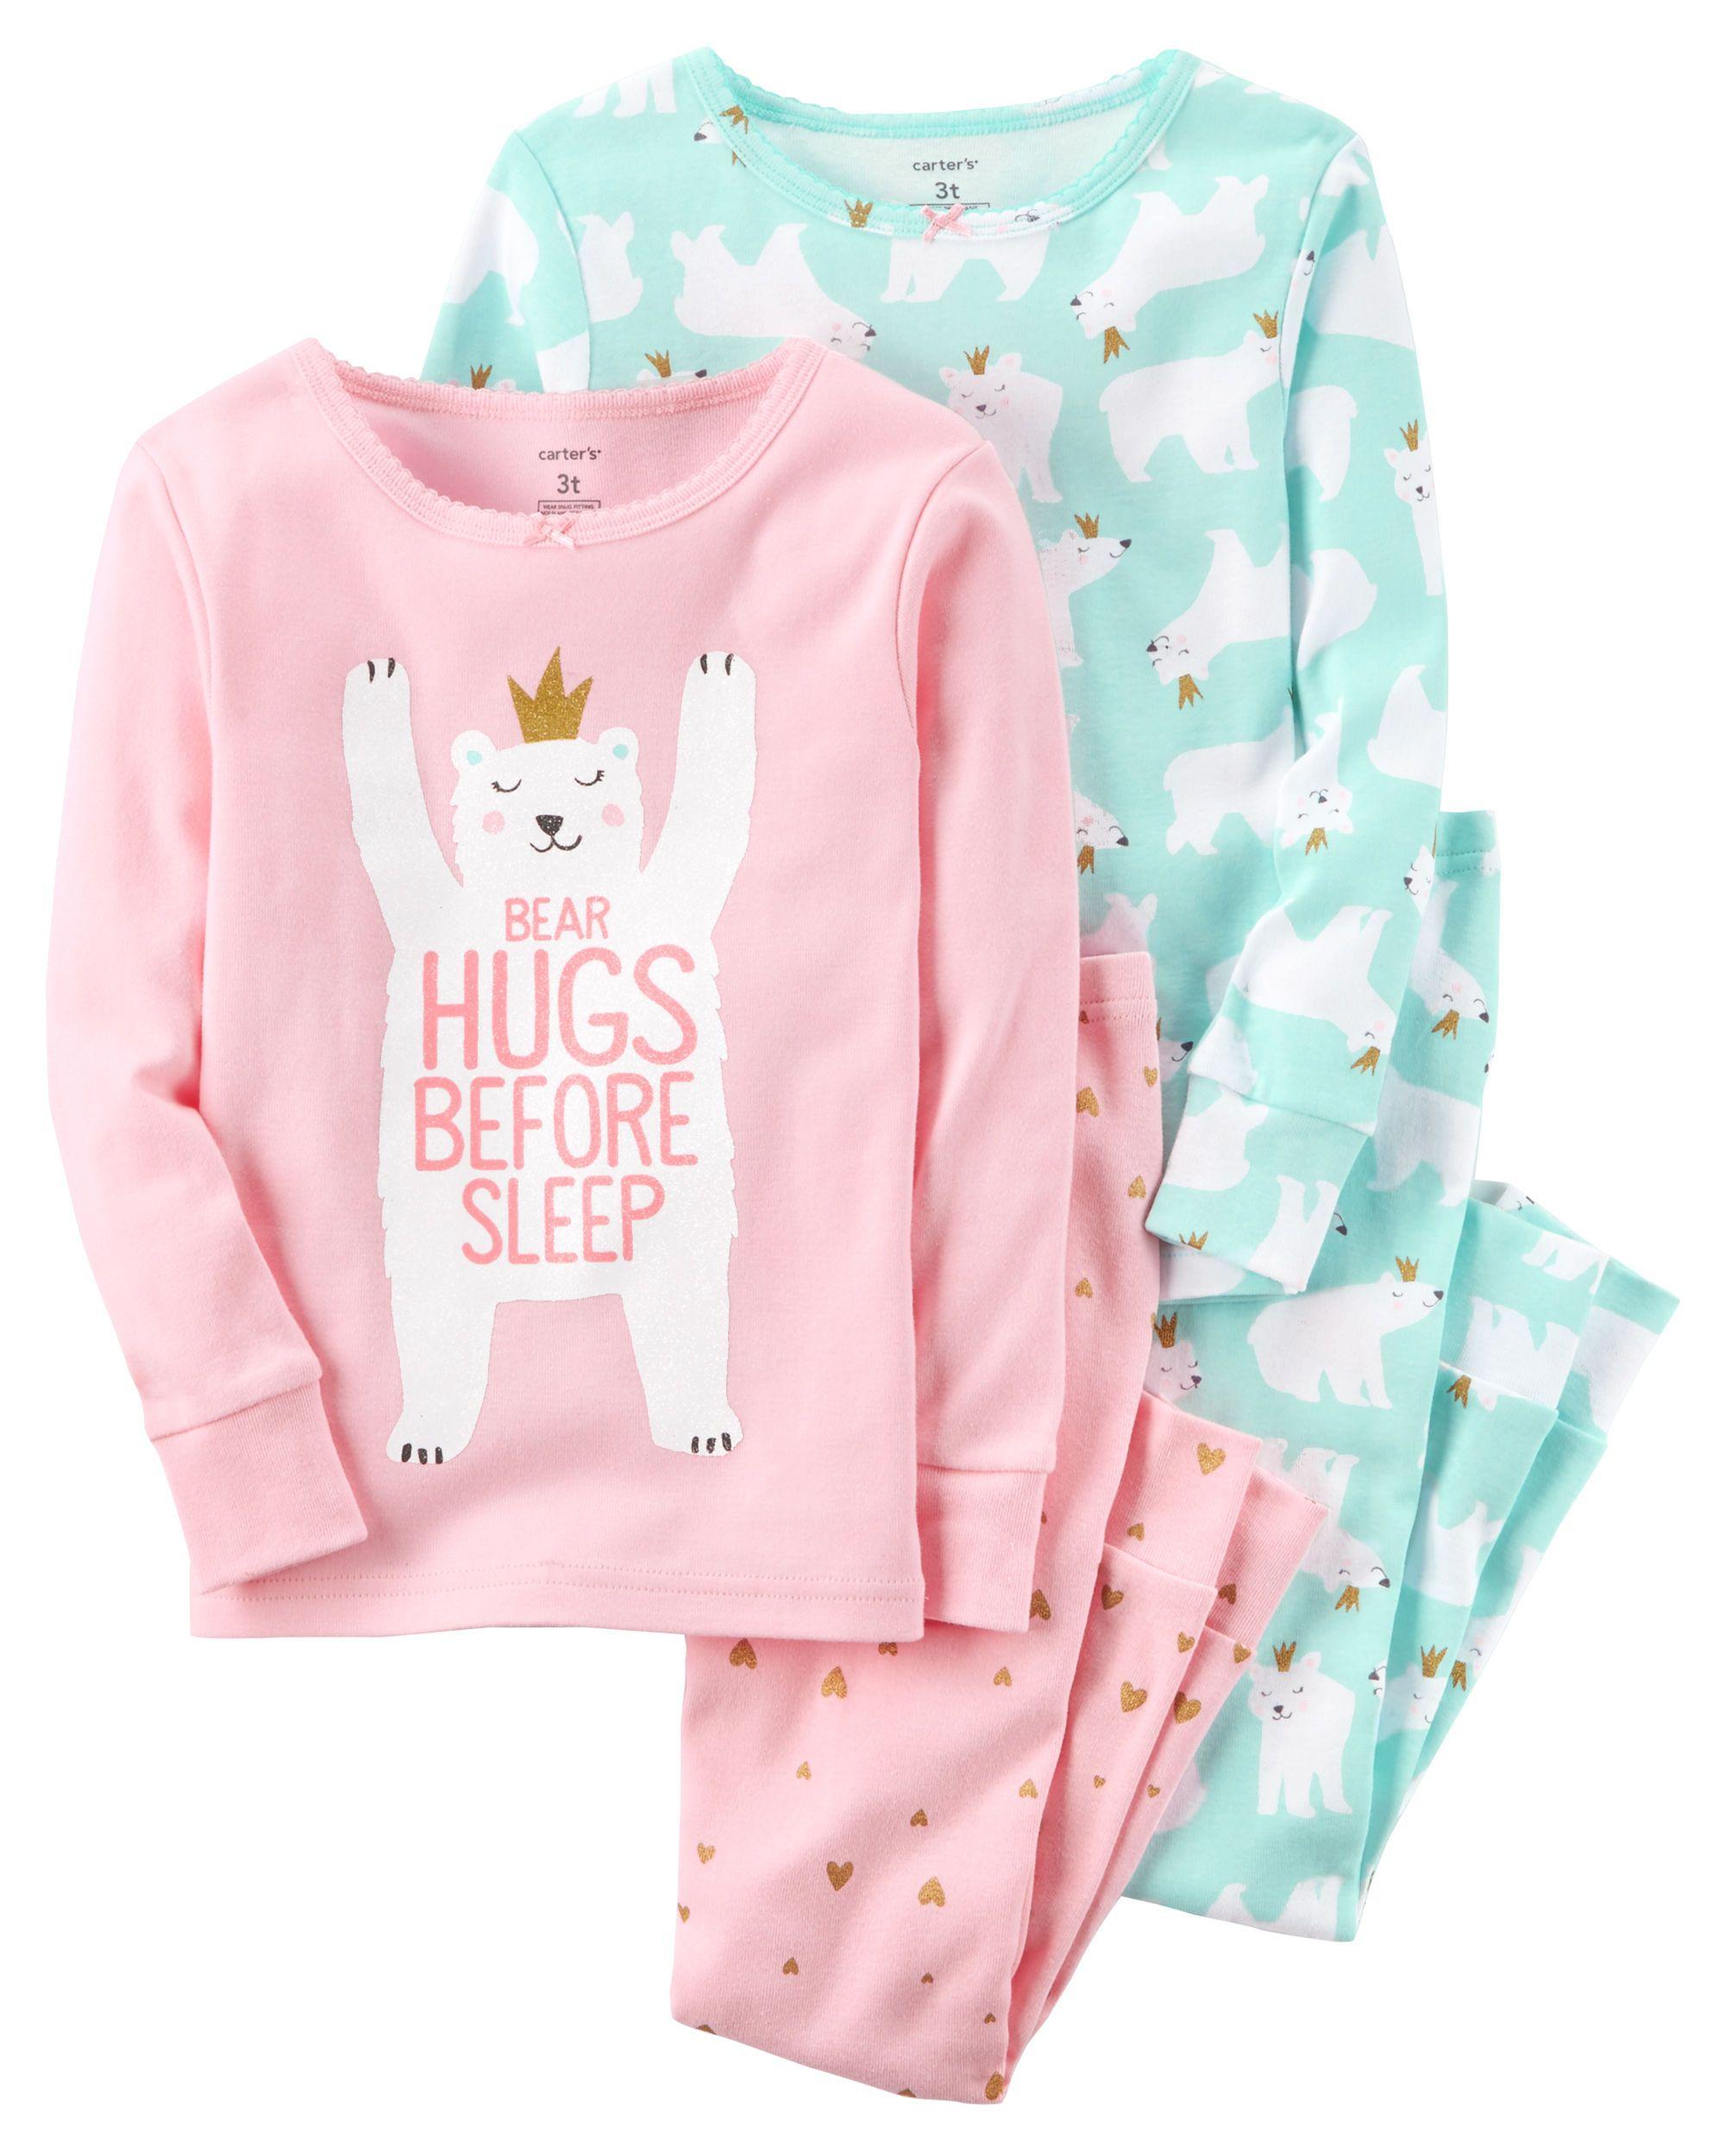 c13dfac8f8 Pyjamas #bear #hug #pink | Charming Childhood | Carters baby clothes ...